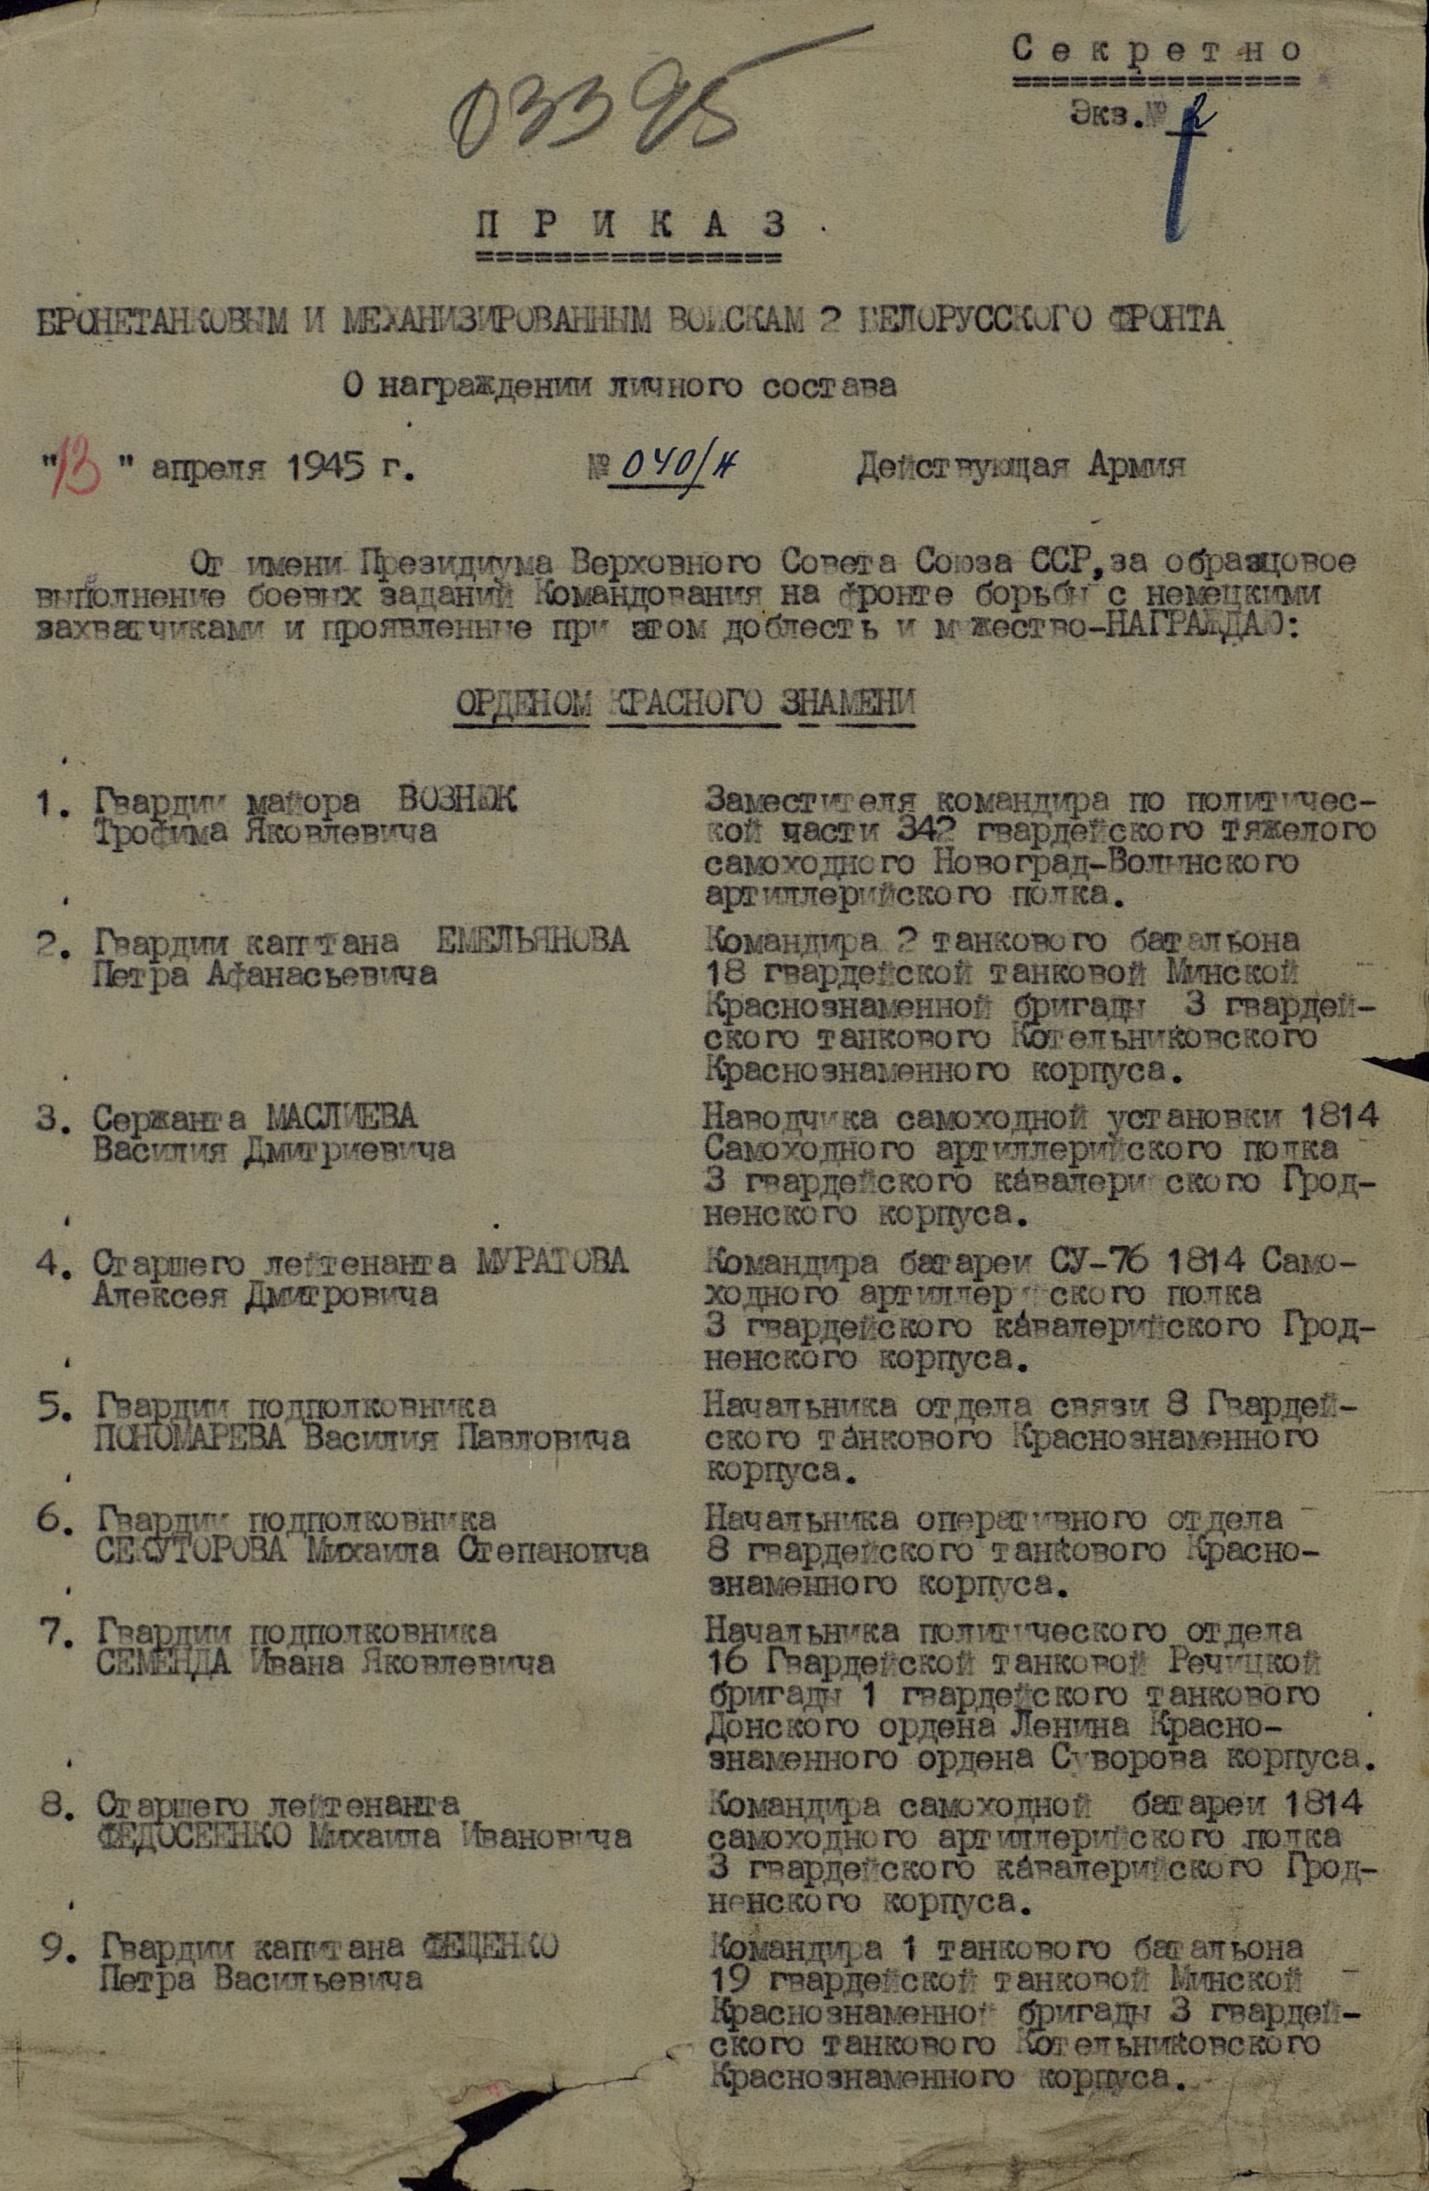 C:\Documents and Settings\Фёдор\Мои документы\История\Маслиев\2.jpg